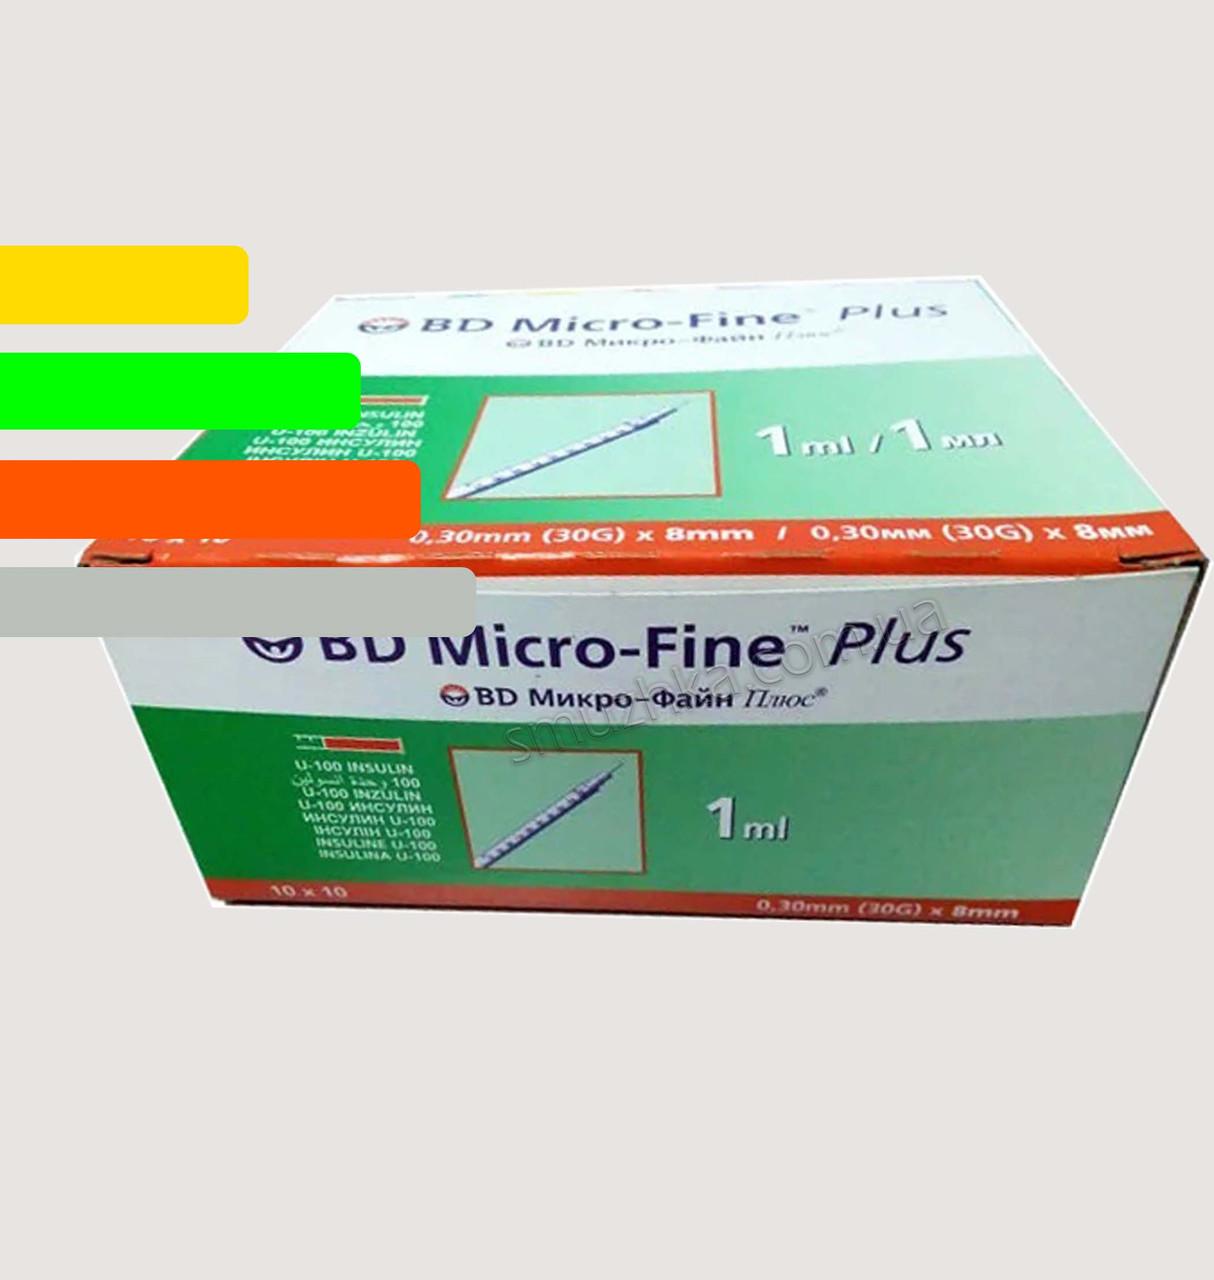 Шприц инсулиновый BD Micro-fine Plus-Микрофайн 1ml, игла 8мм уп. 100 шт.